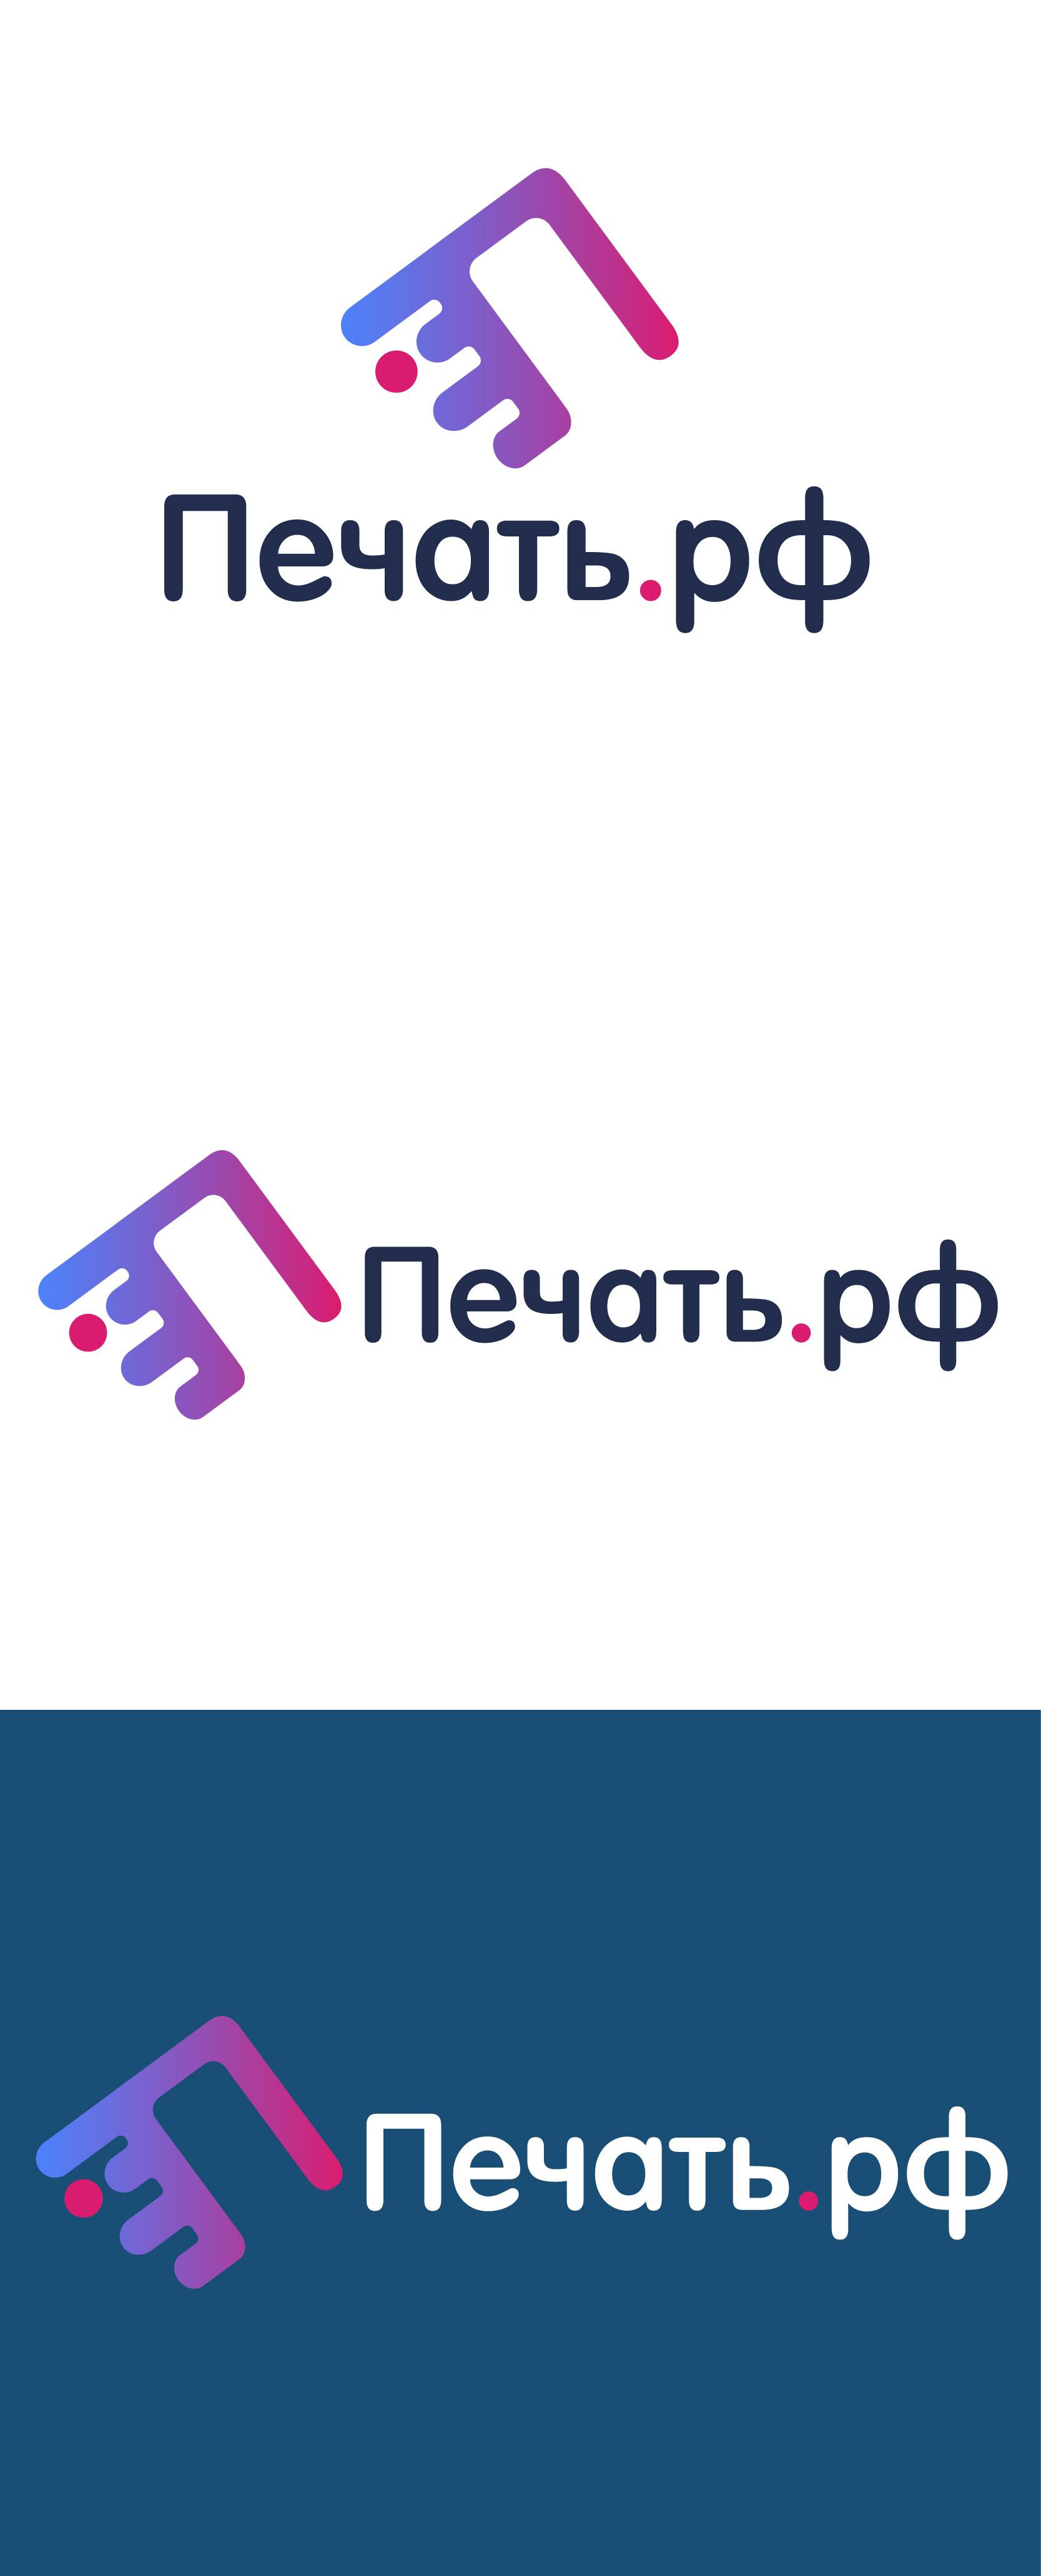 Логотип для веб-сервиса интерьерной печати и оперативной пол фото f_3155d2c01148d194.jpg